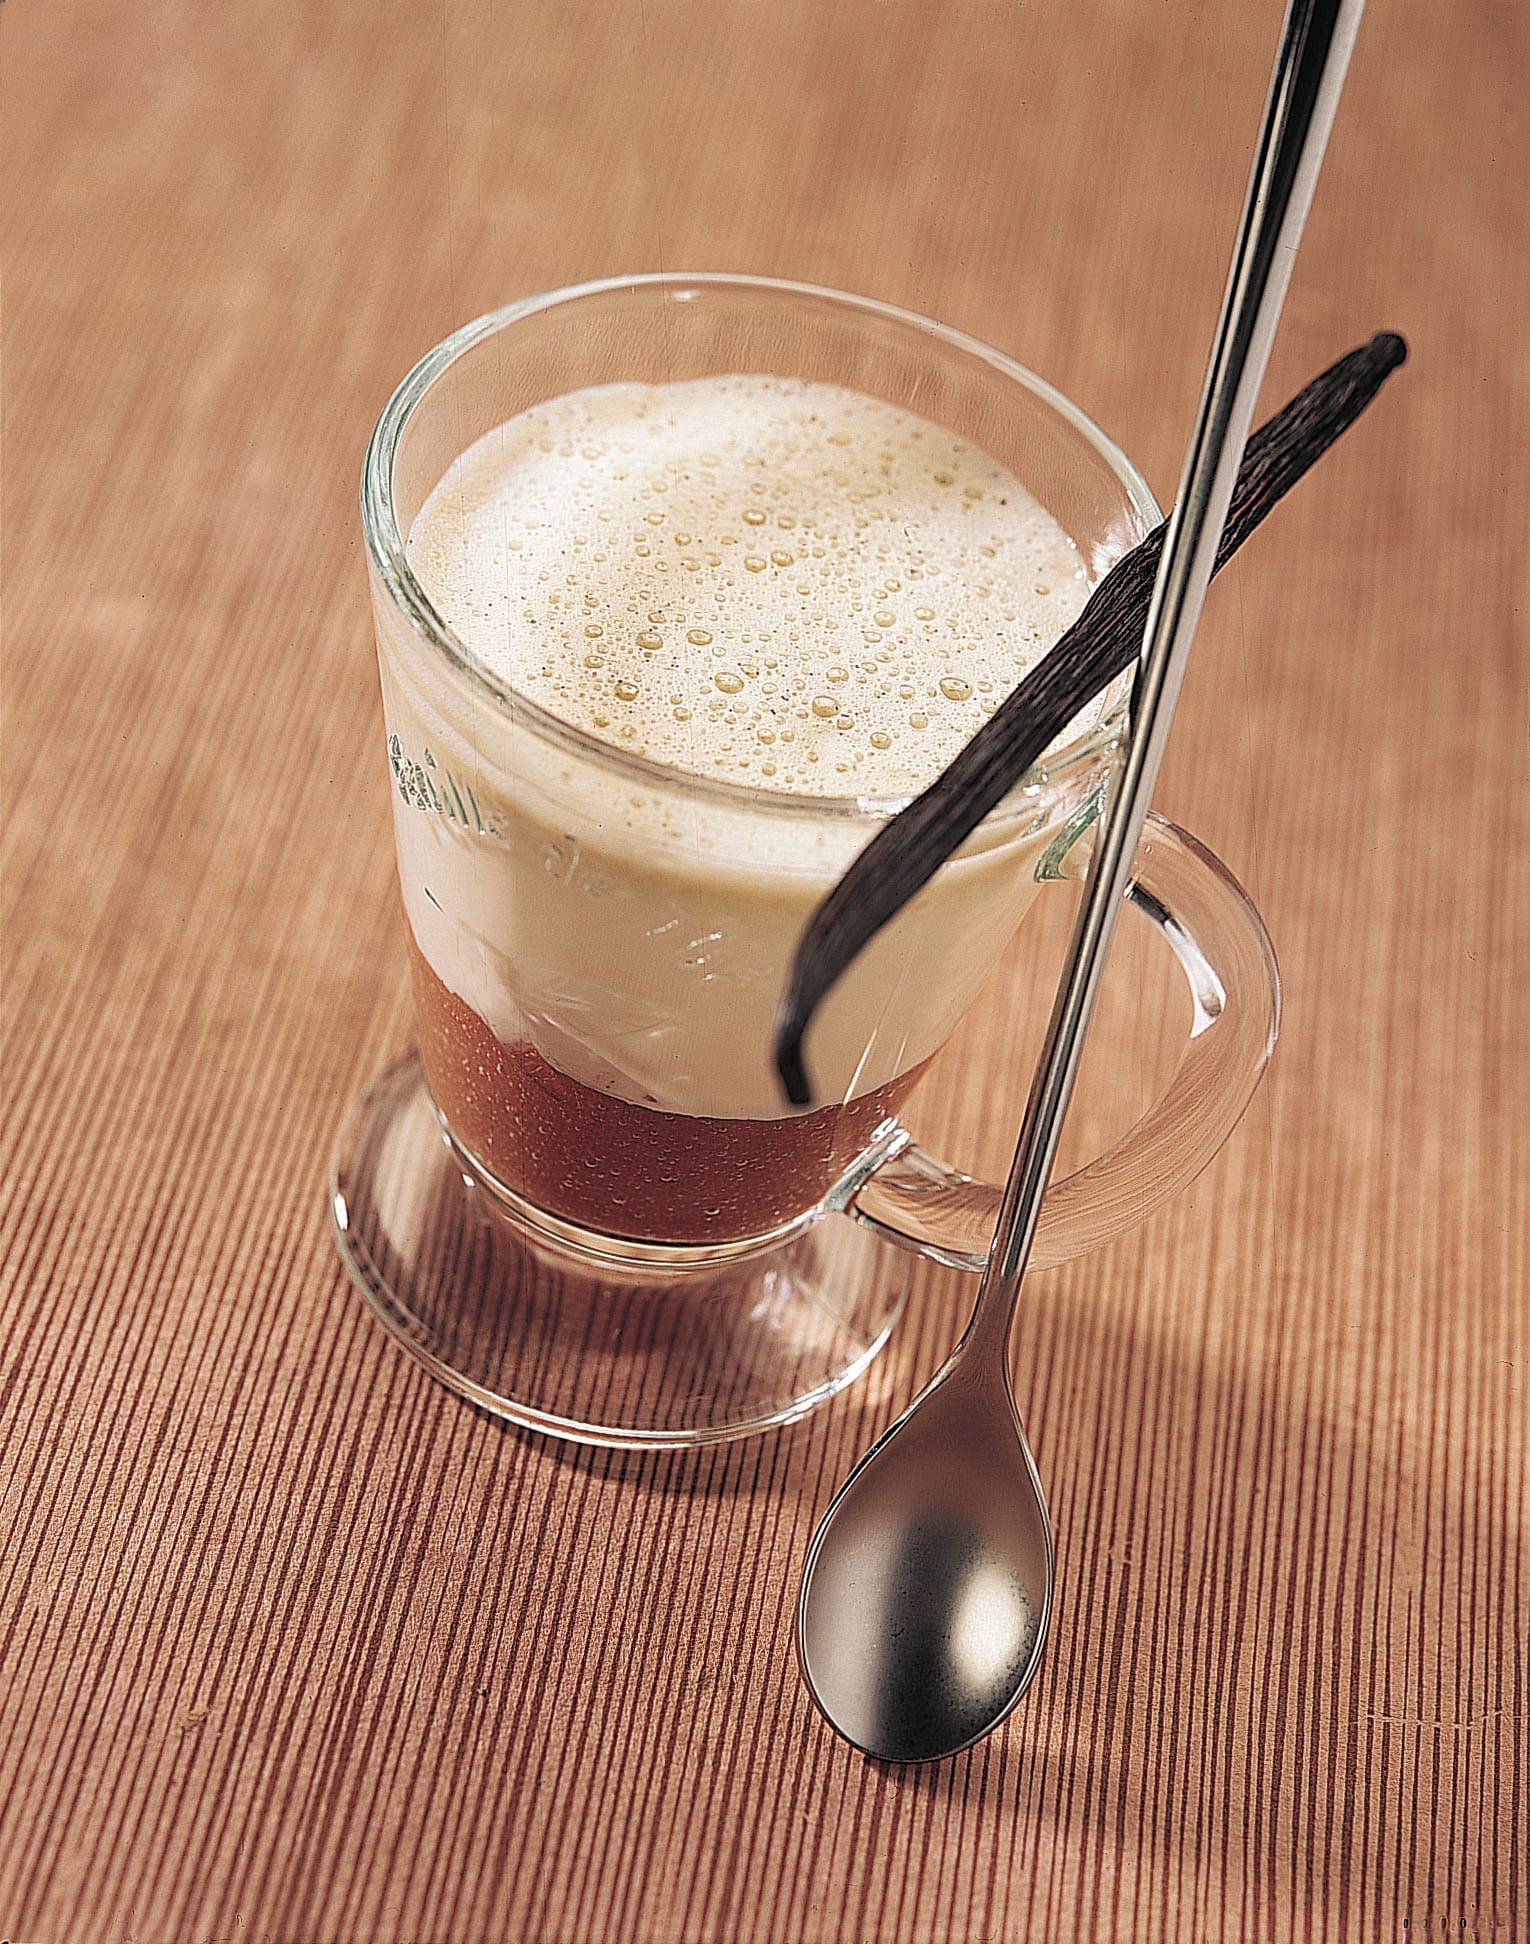 Warme Rhabarber-Schokolade